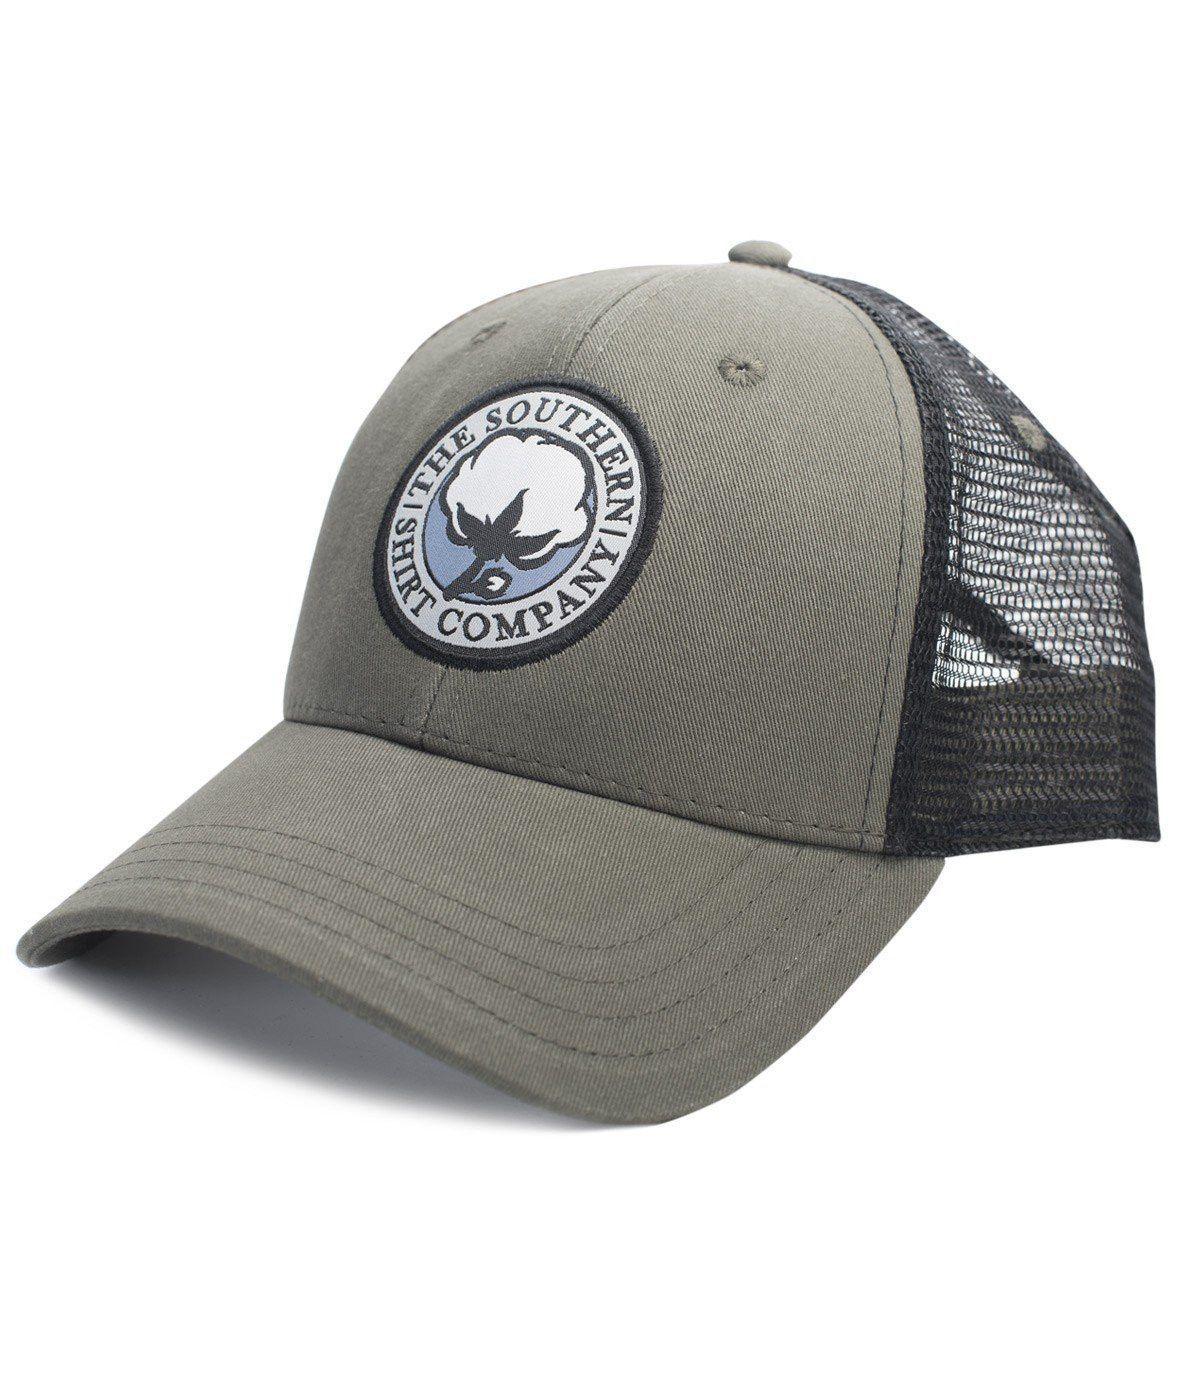 0e74aeccadb Southern Shirt Company- Mesh Back Trucker Hat